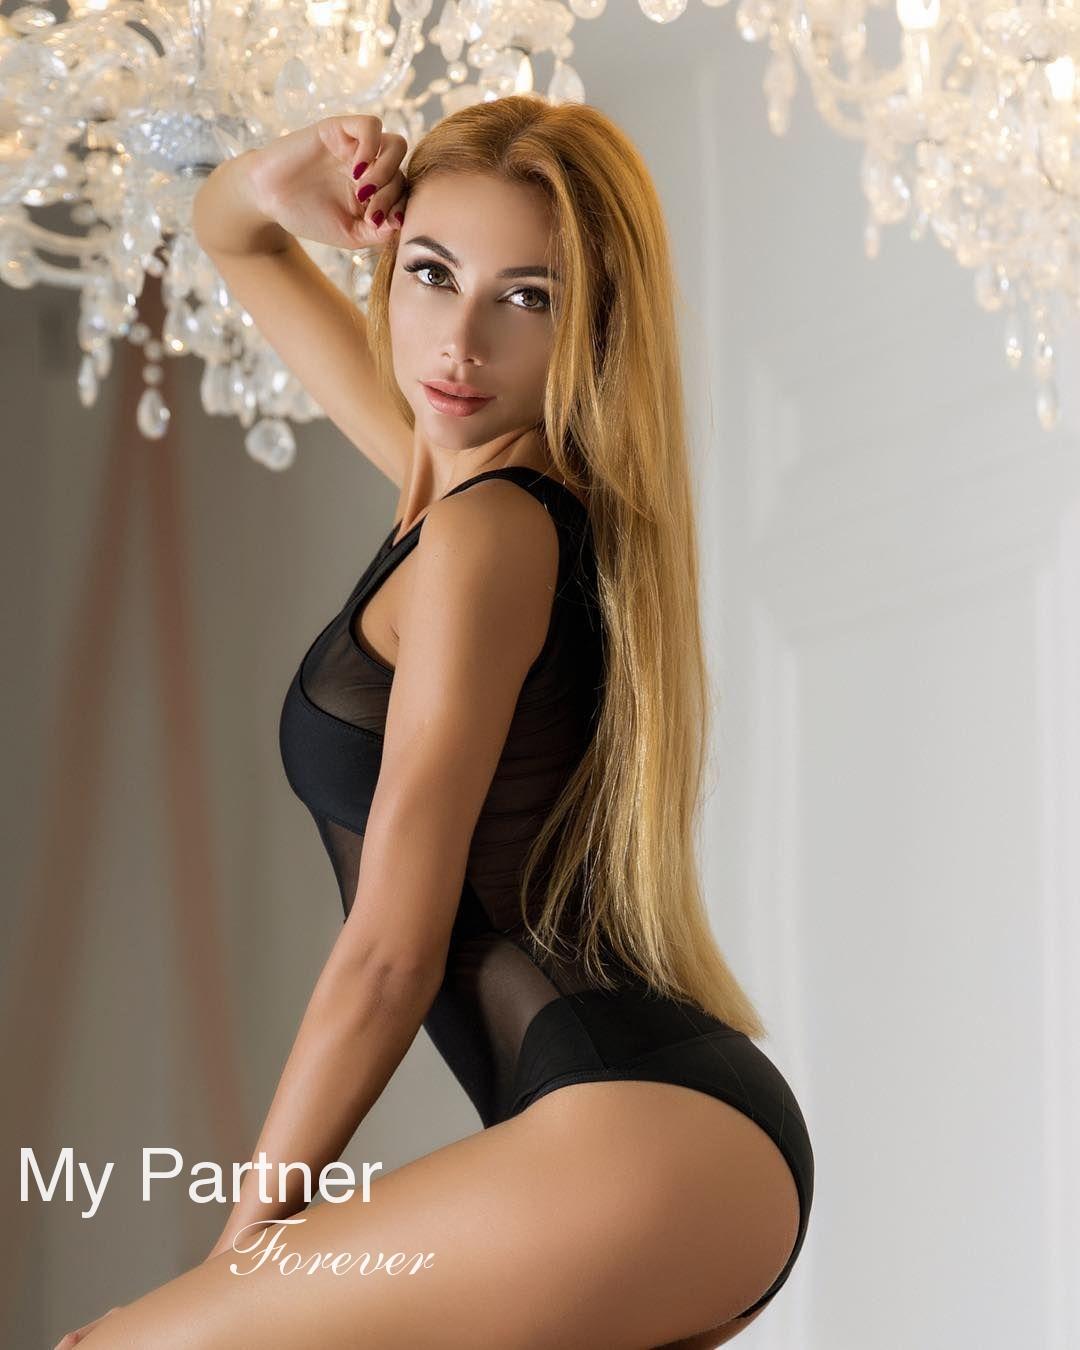 Datingsite to Meet Single Ukrainian Lady Yuliya from Kiev, Ukraine